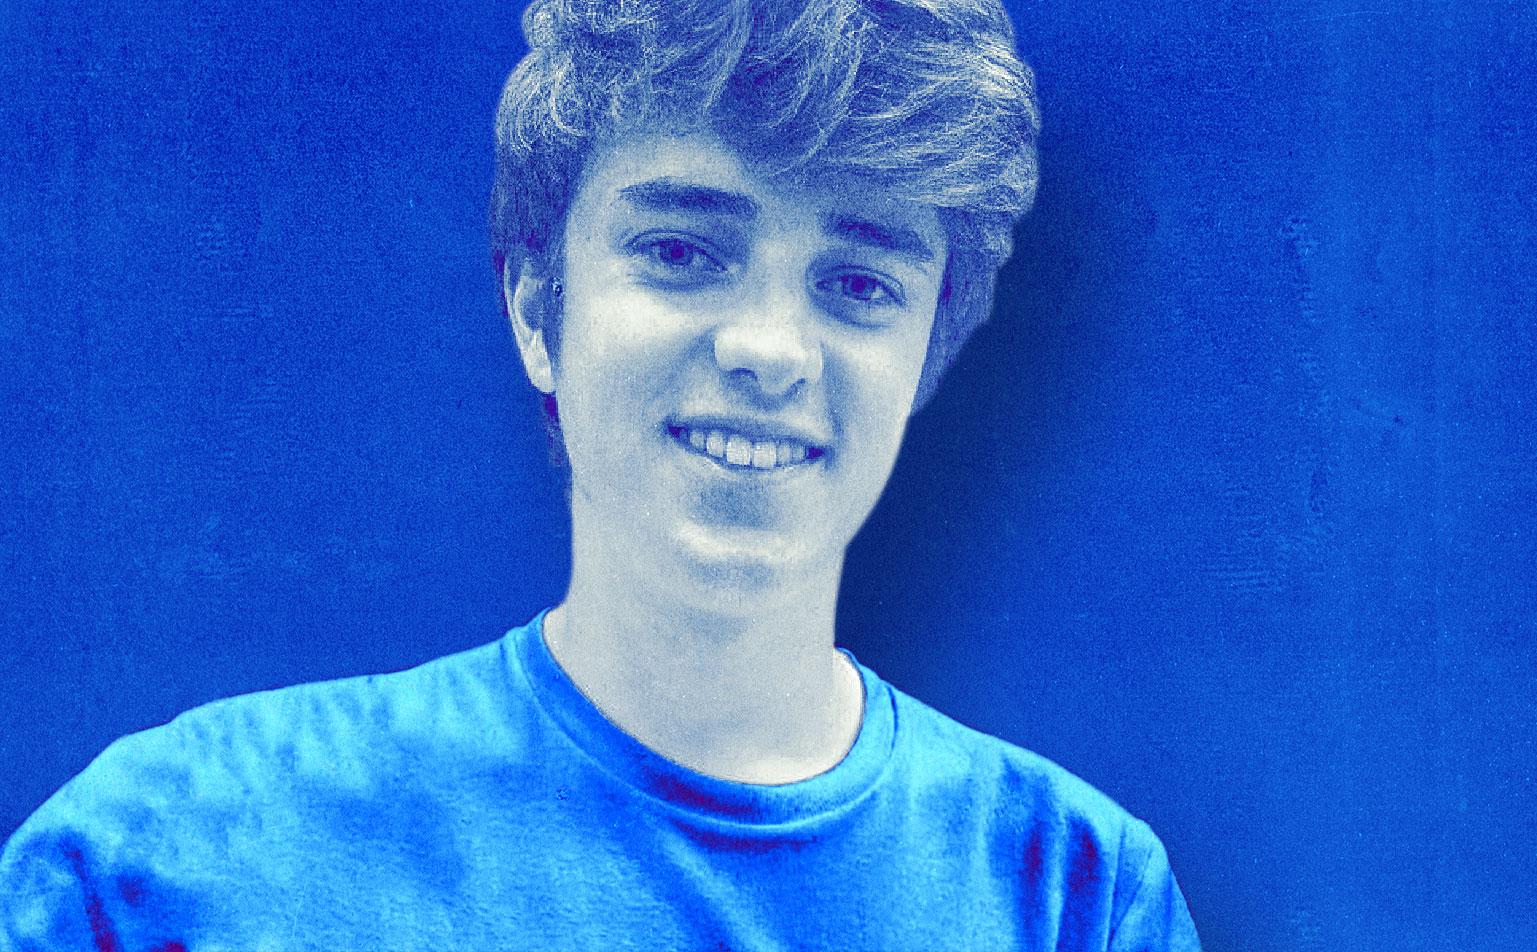 Toronto Teen Raises More Than $50,000 For Bahamian Hurricane Dorian Relief